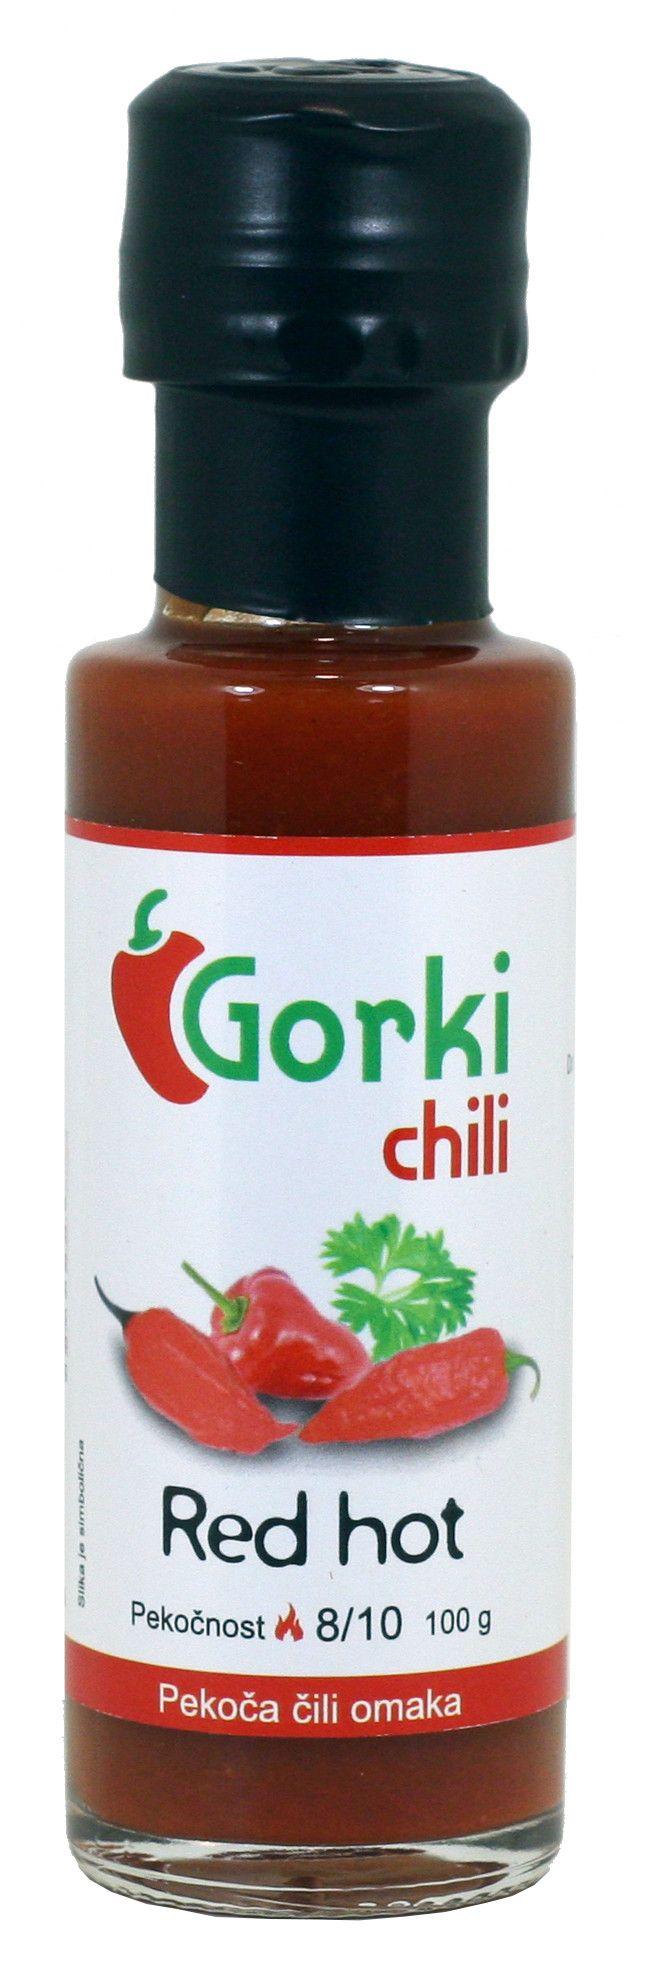 GORKI CHILI - SALSA PICCANTE RED HOT GR. 100